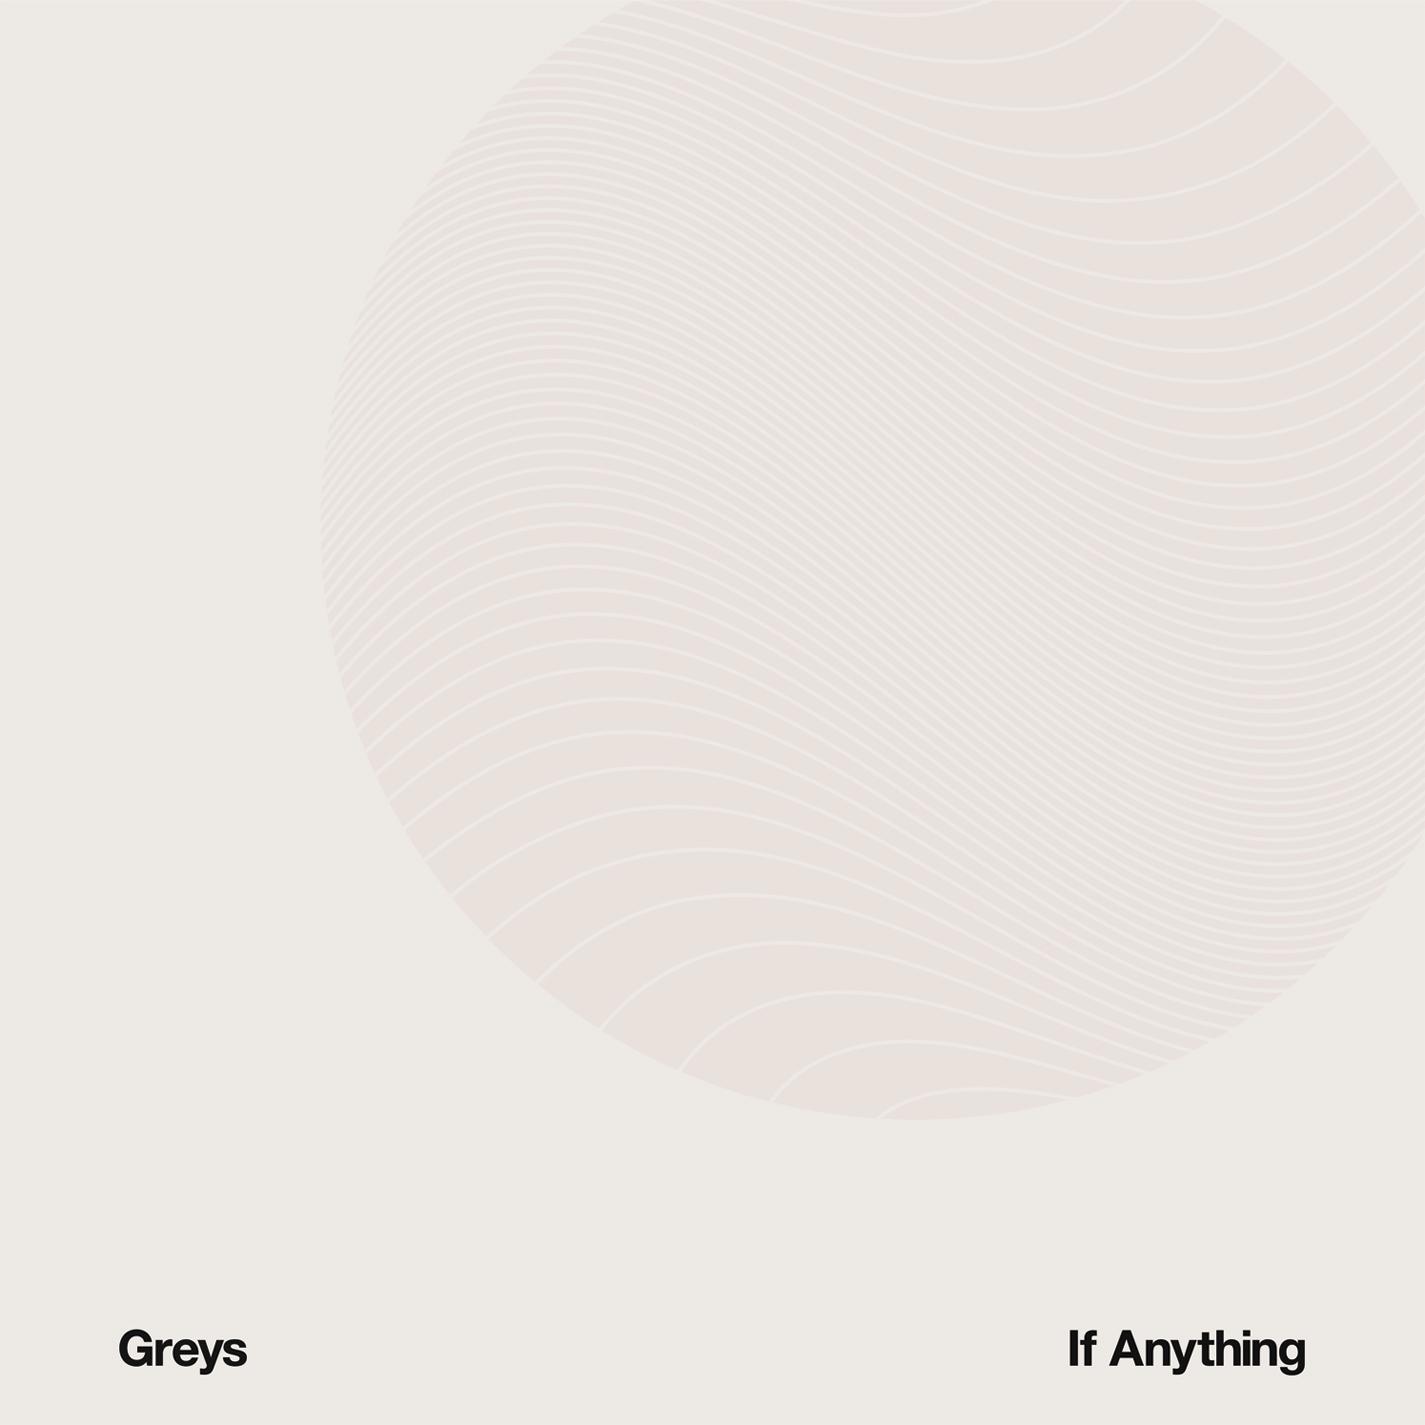 Greys_cover_72dpi_1425px